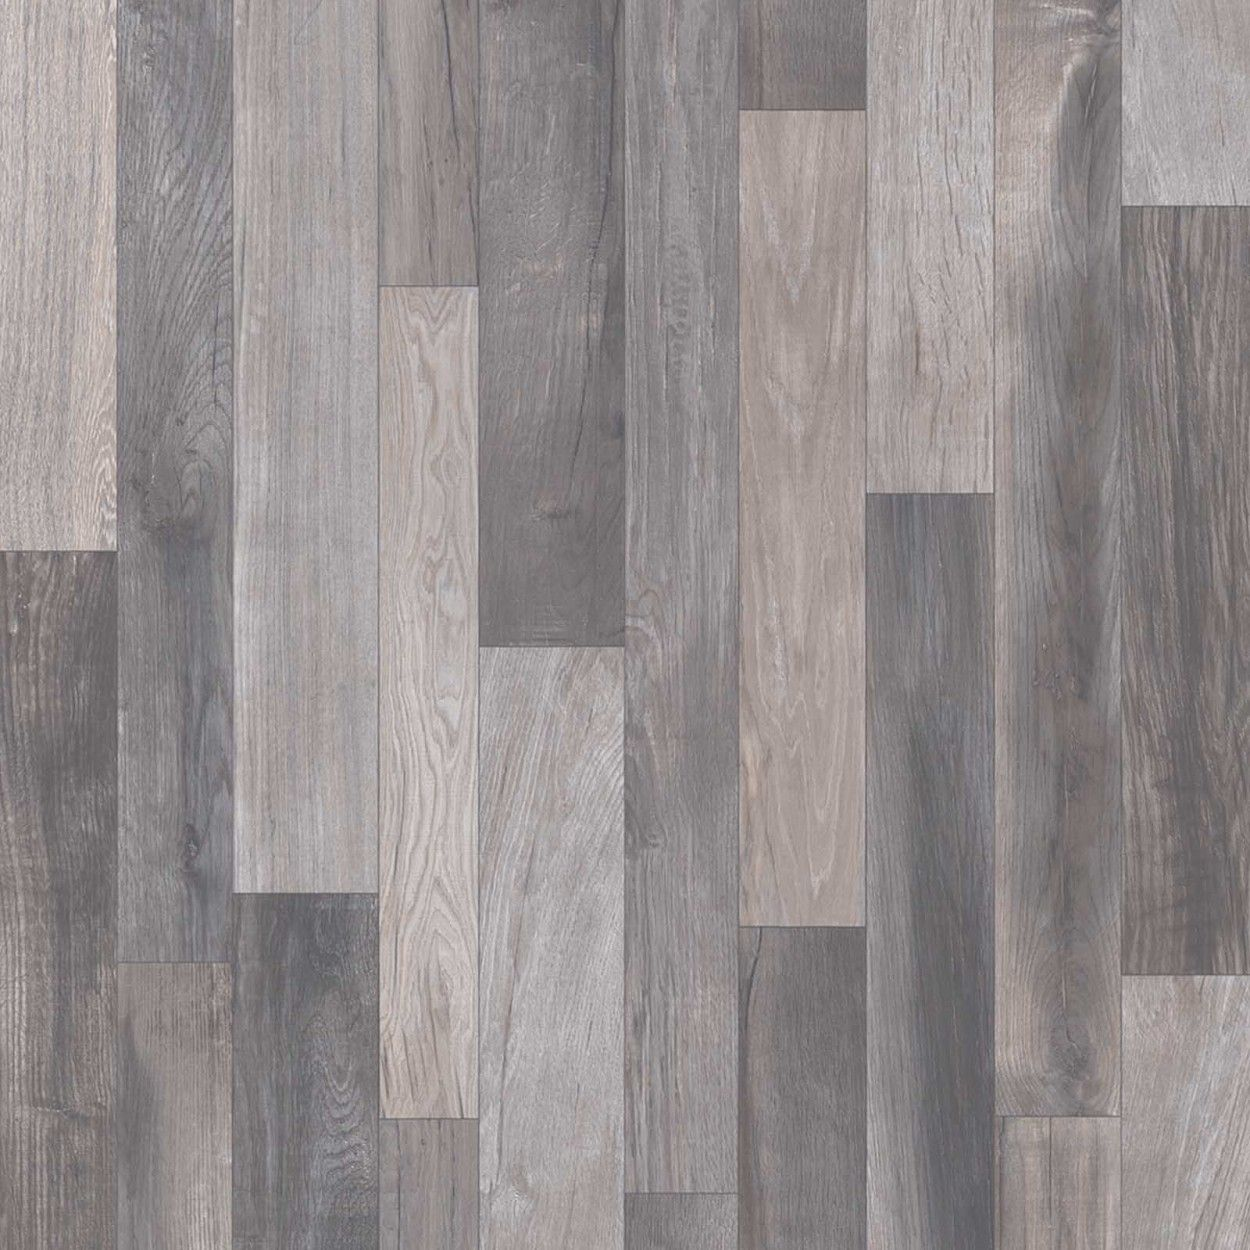 Sol Vinyle Imitation Parquet Gris Patchwork Woodfloortexture In